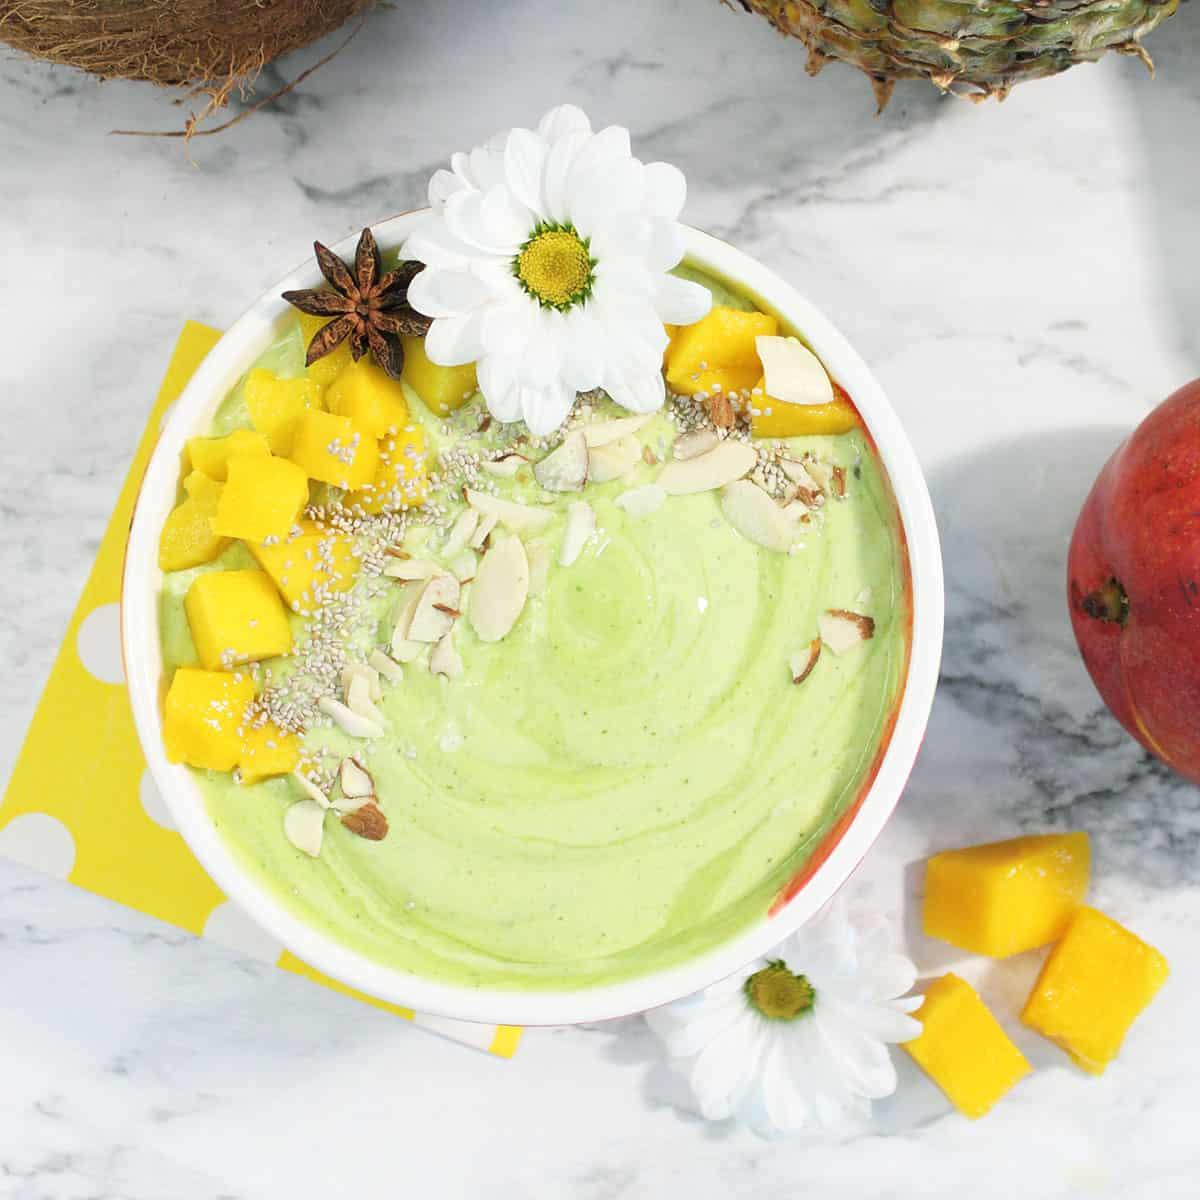 Green Pina Colada Smoothie in bowl on white table with mango pieces around bowl.